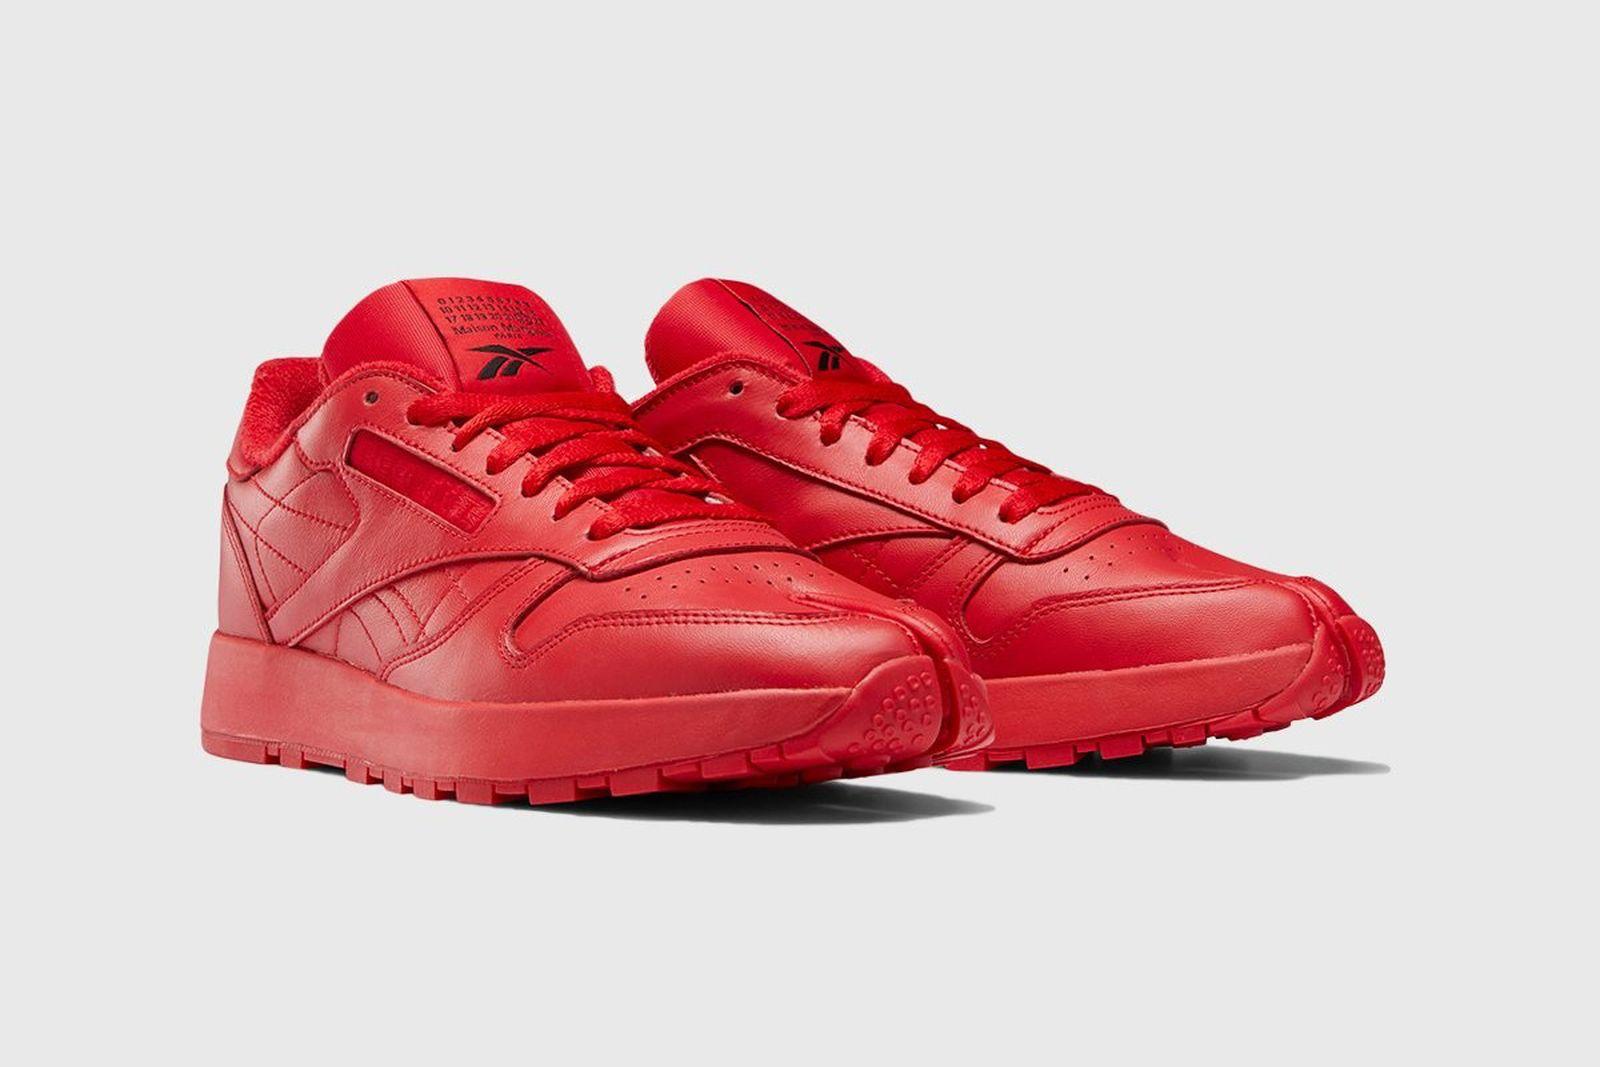 maison-margiela-reebok-classic-leather-tabi-red-grey-release-date-price-13